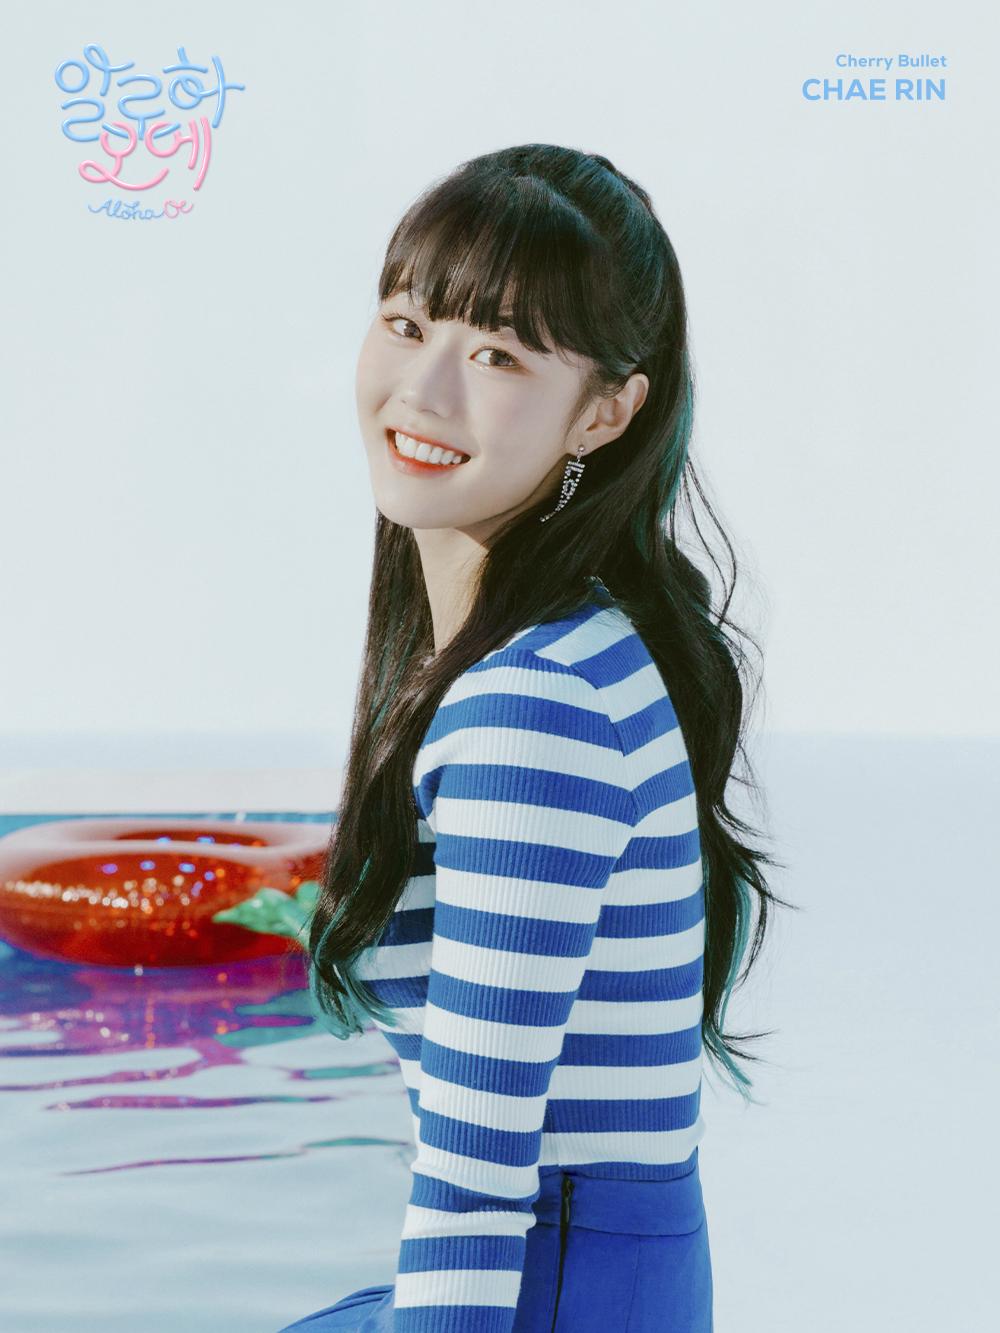 Chae Rin (Cherry Bullet)